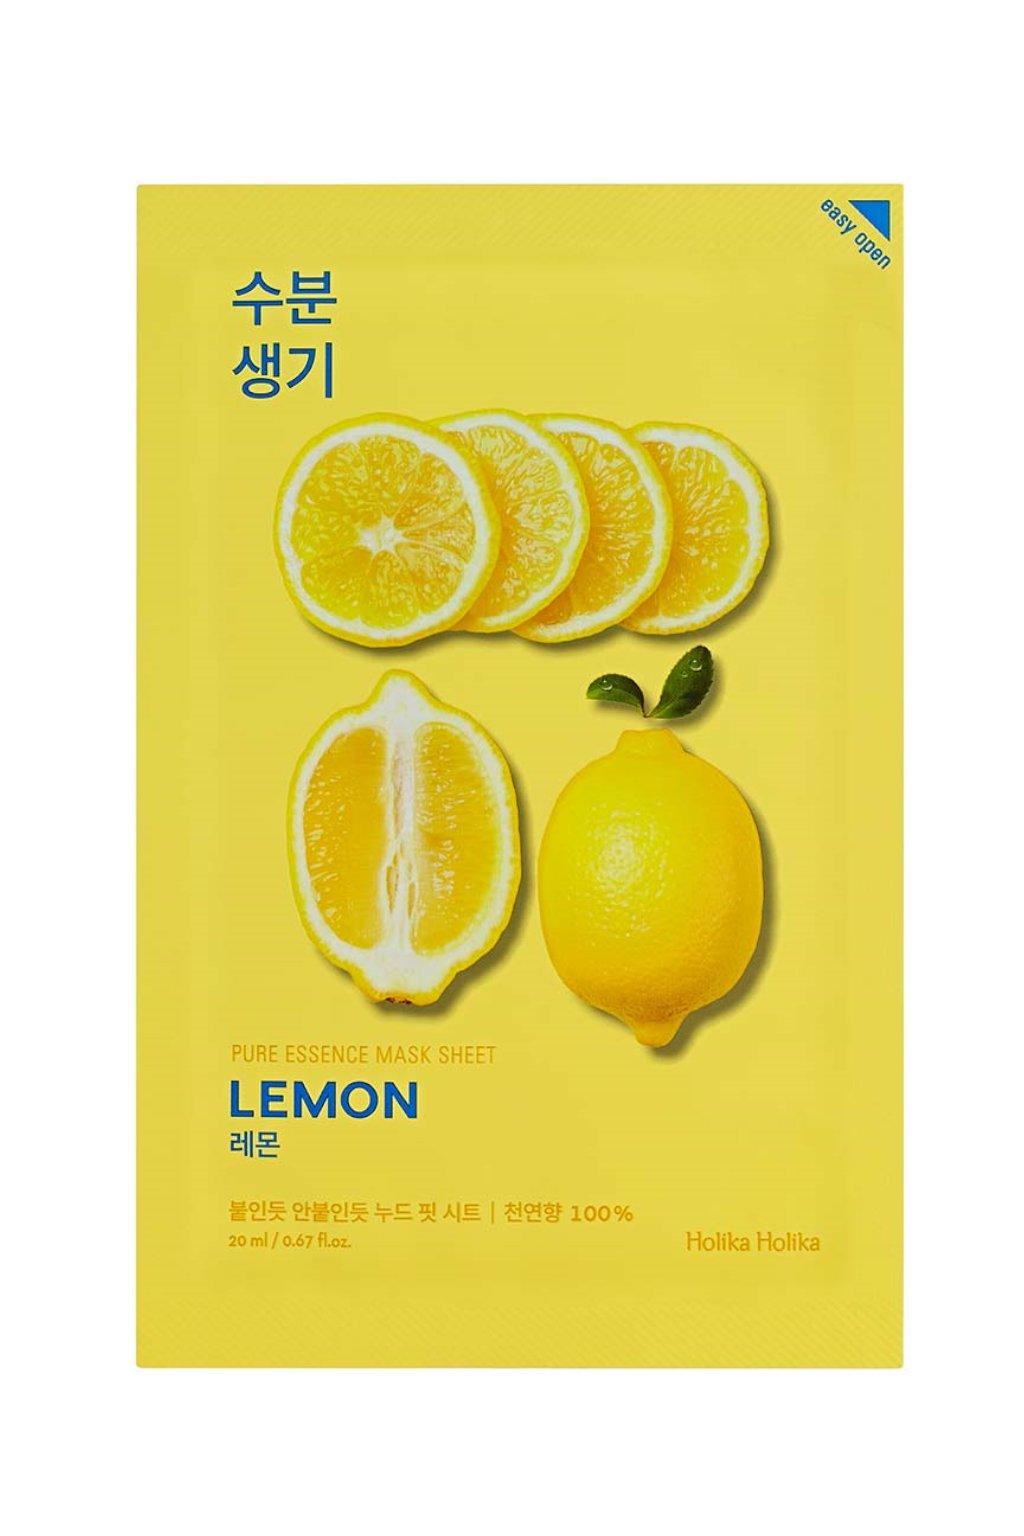 Holika Holika Pure Essence Lemon Mask